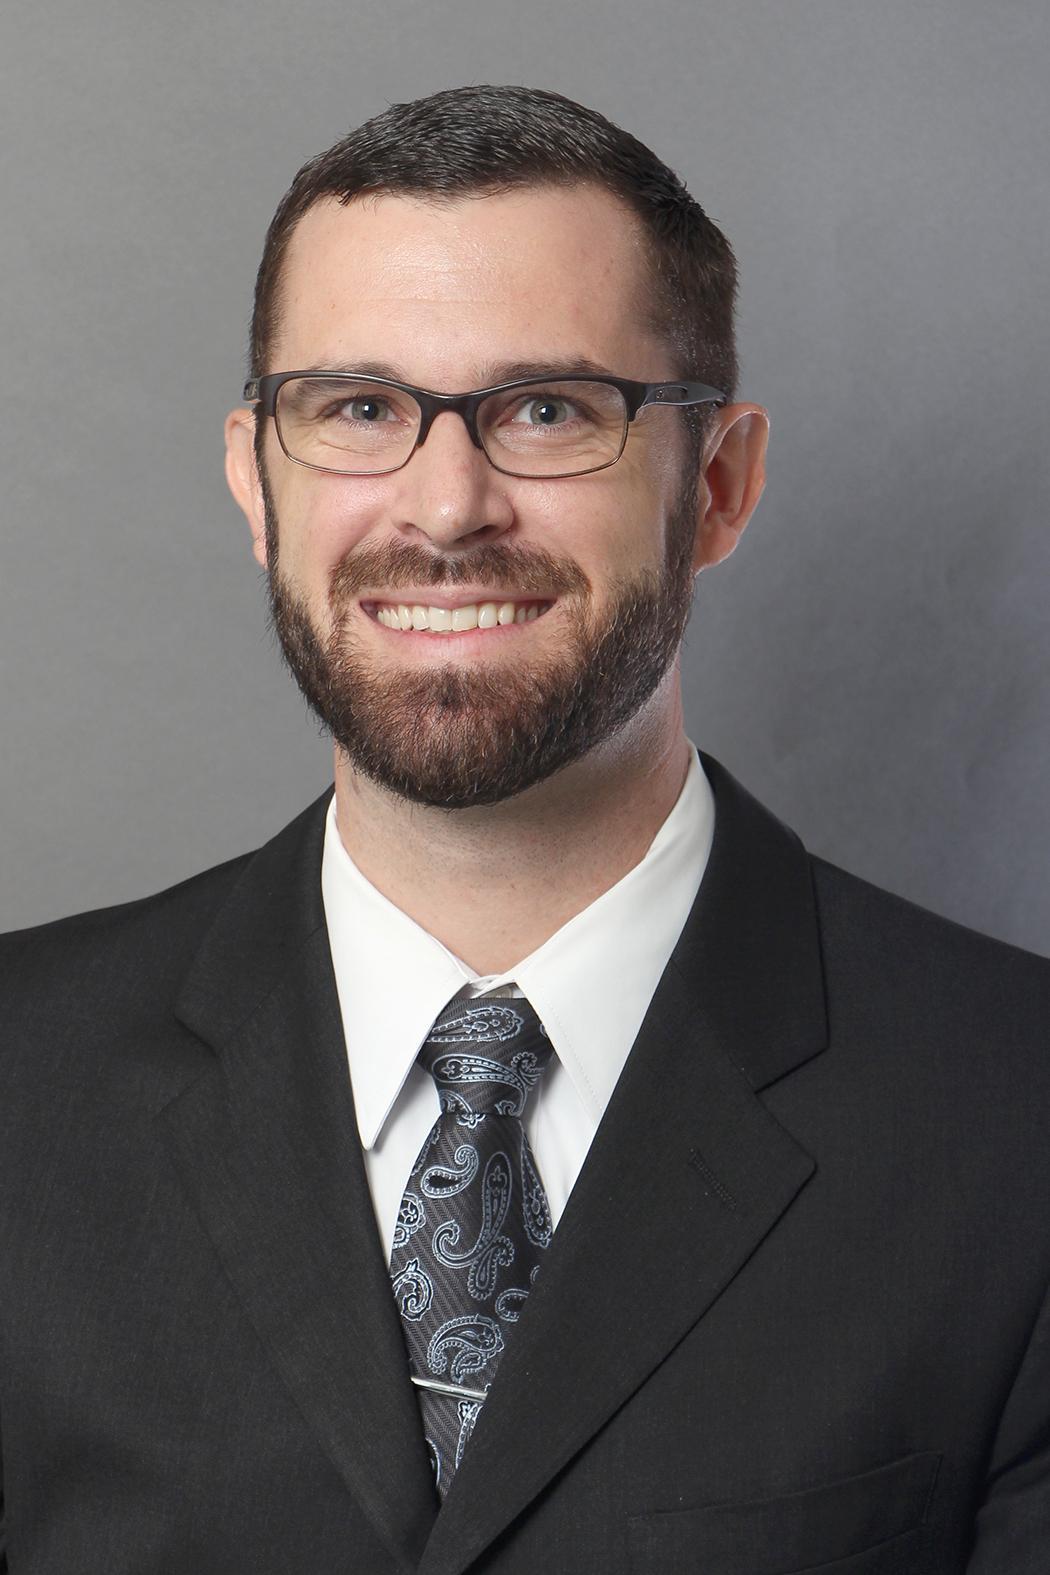 NICHOLAS JOSEPH MCCARTHY Insurance Agent